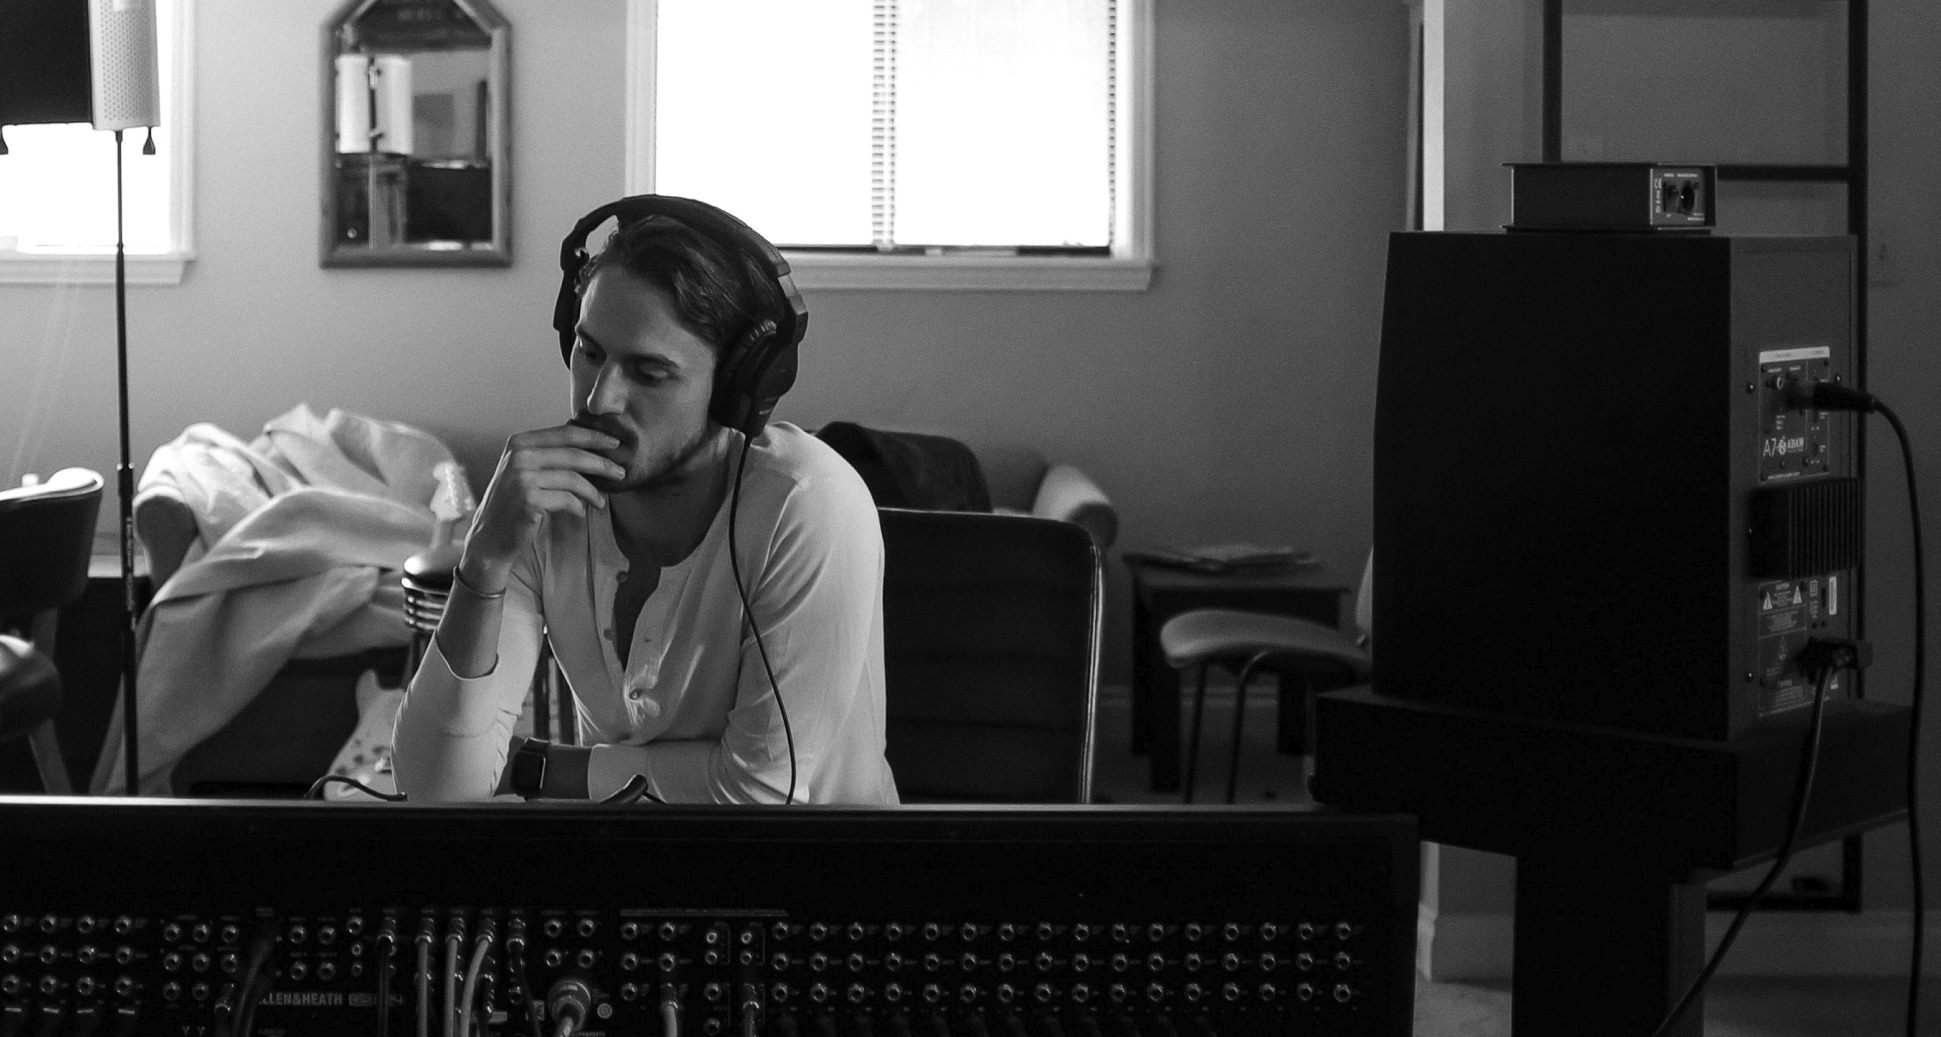 A man wearing headphones is enjoying music